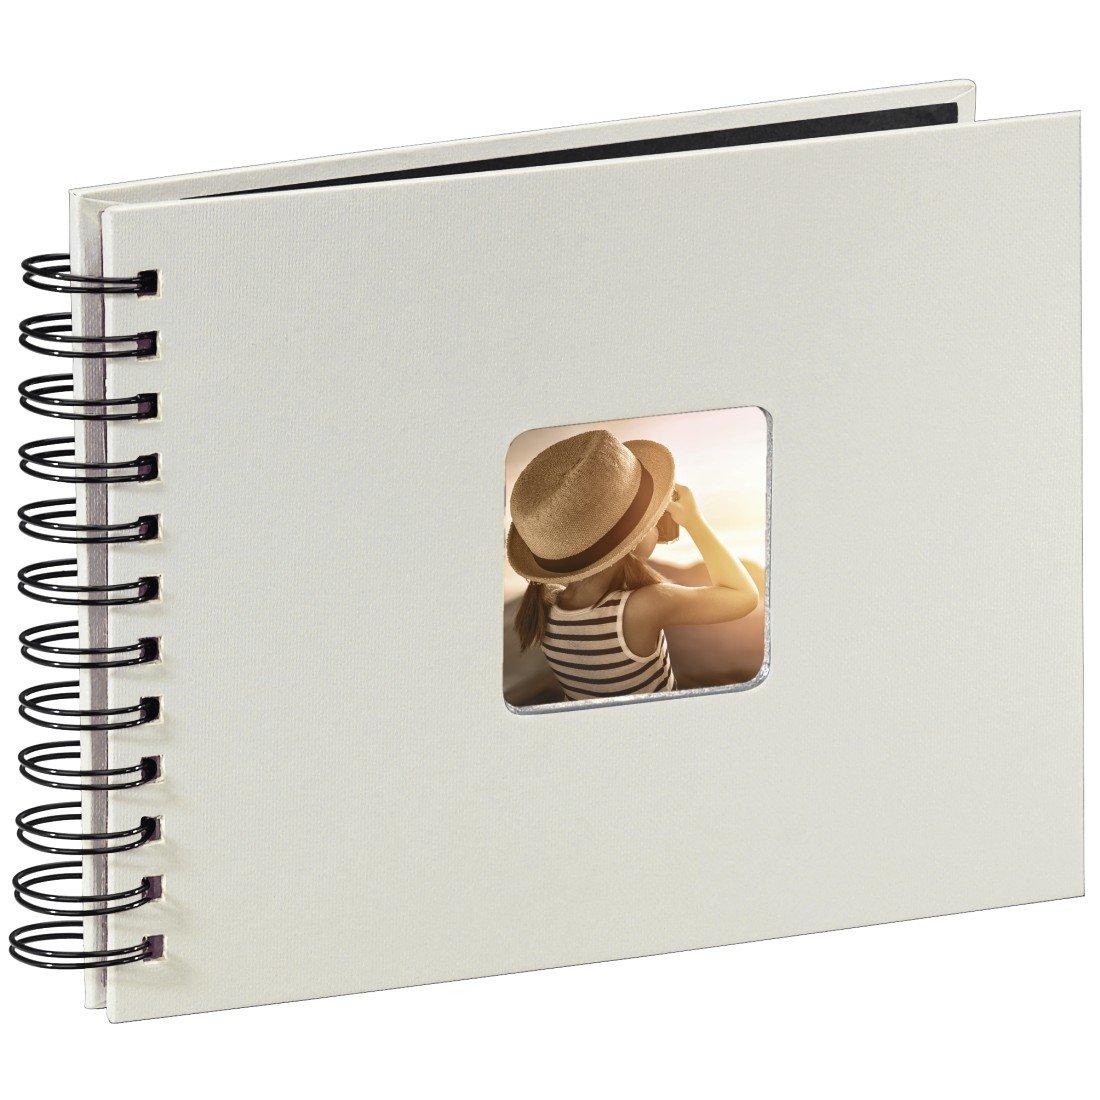 Hama 2107 Album Spiralato Fine Art, 24 x 27 cm, 50 Pagine, 50 Foto, Bianco 00002107